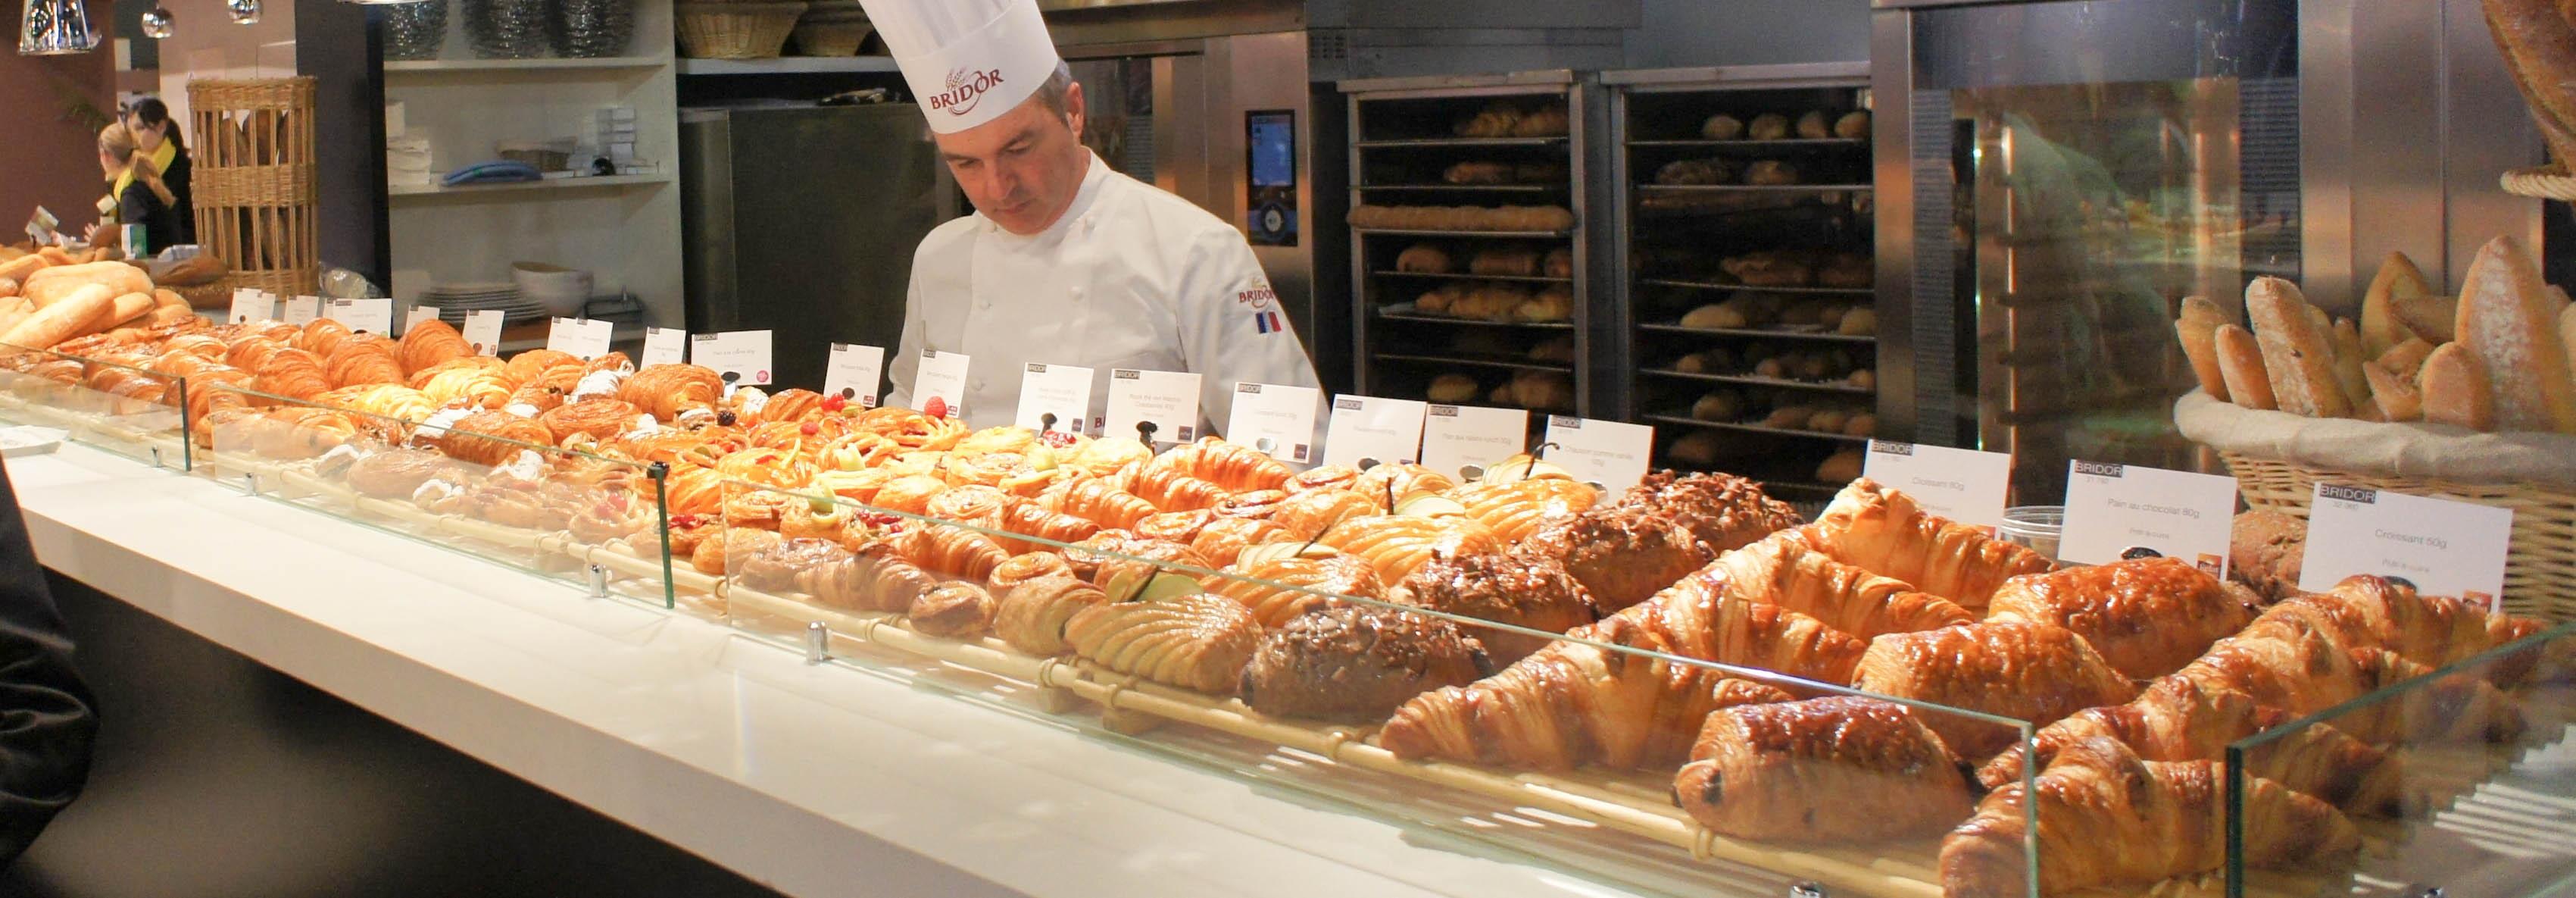 Boulangerie artisanale villepinte